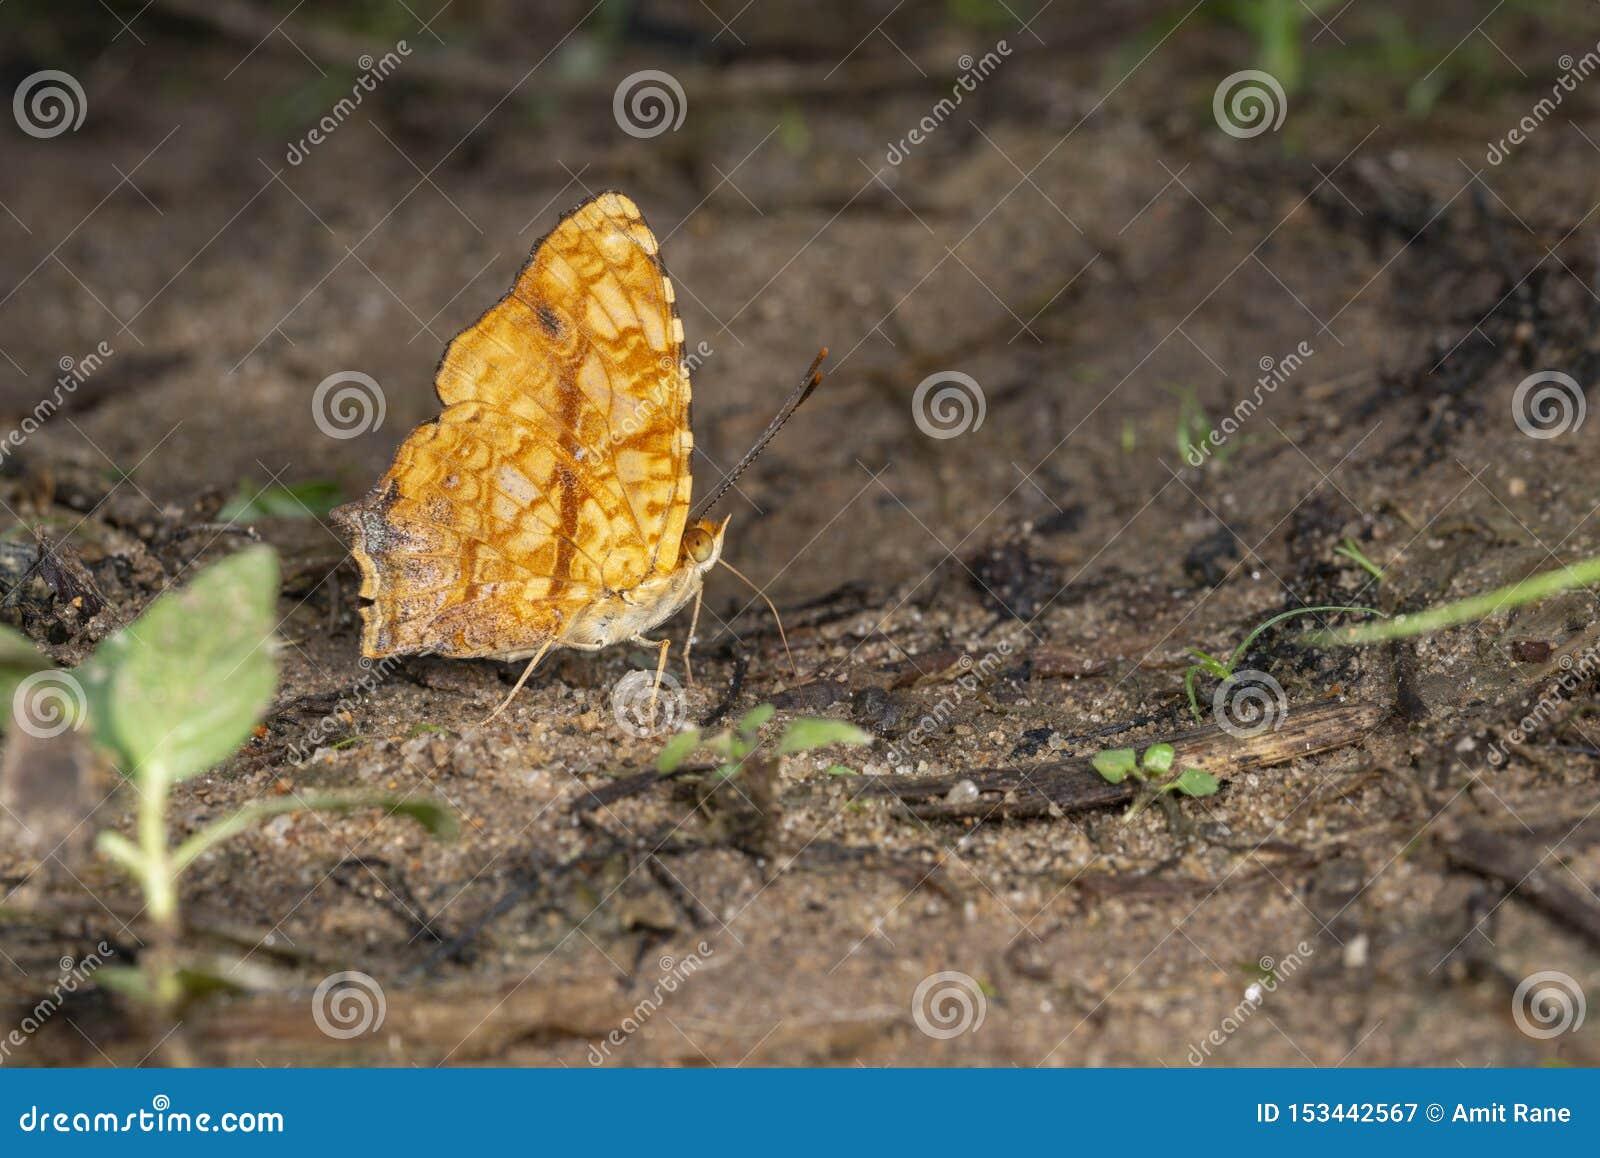 Jester Butterfly comum em montes de Garo, Meghalaya, Índia